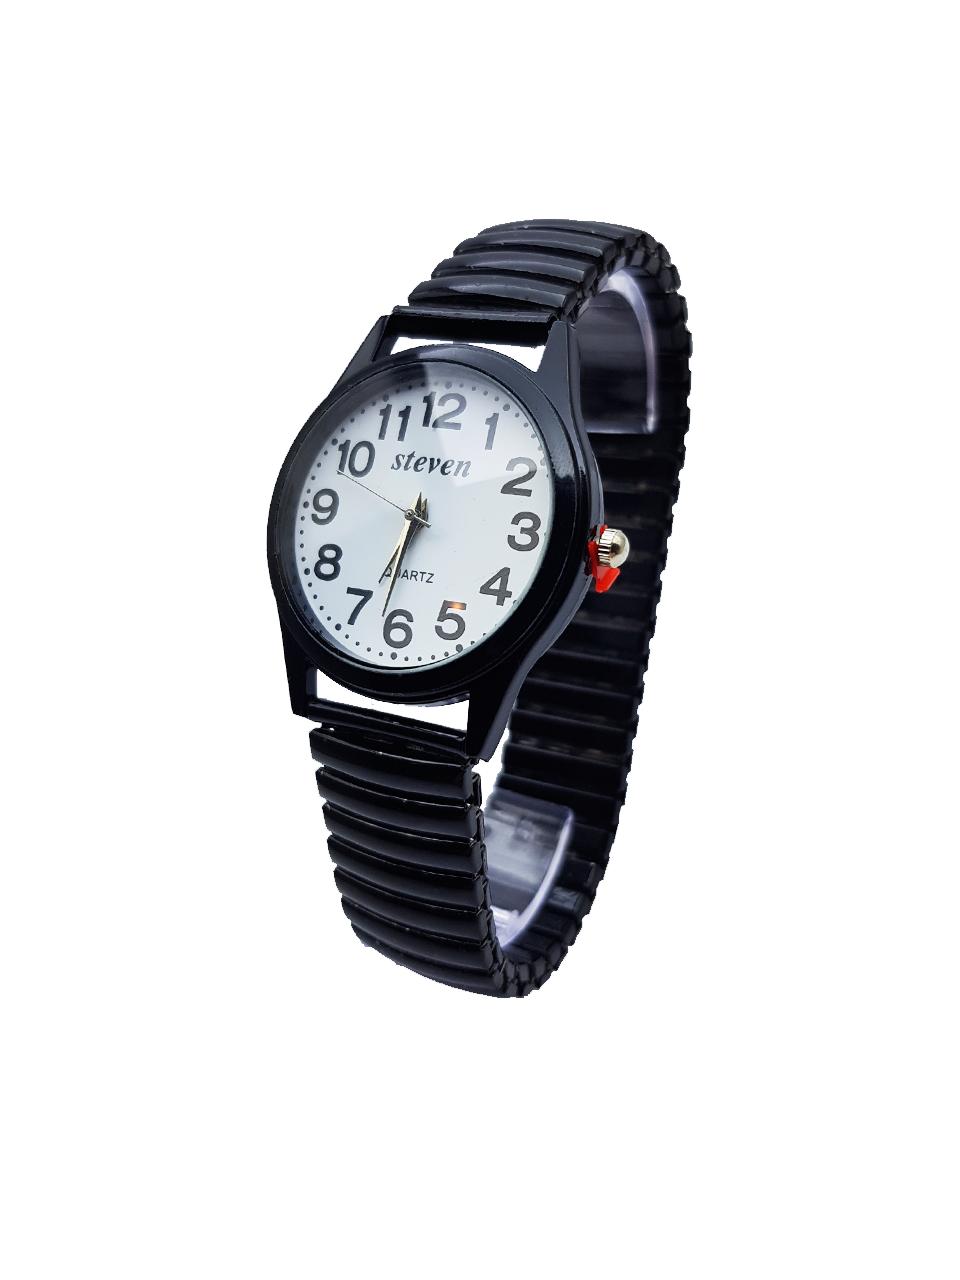 c59695e2bc77 Часы наручные женские STEVEN, кварц, черный цвет